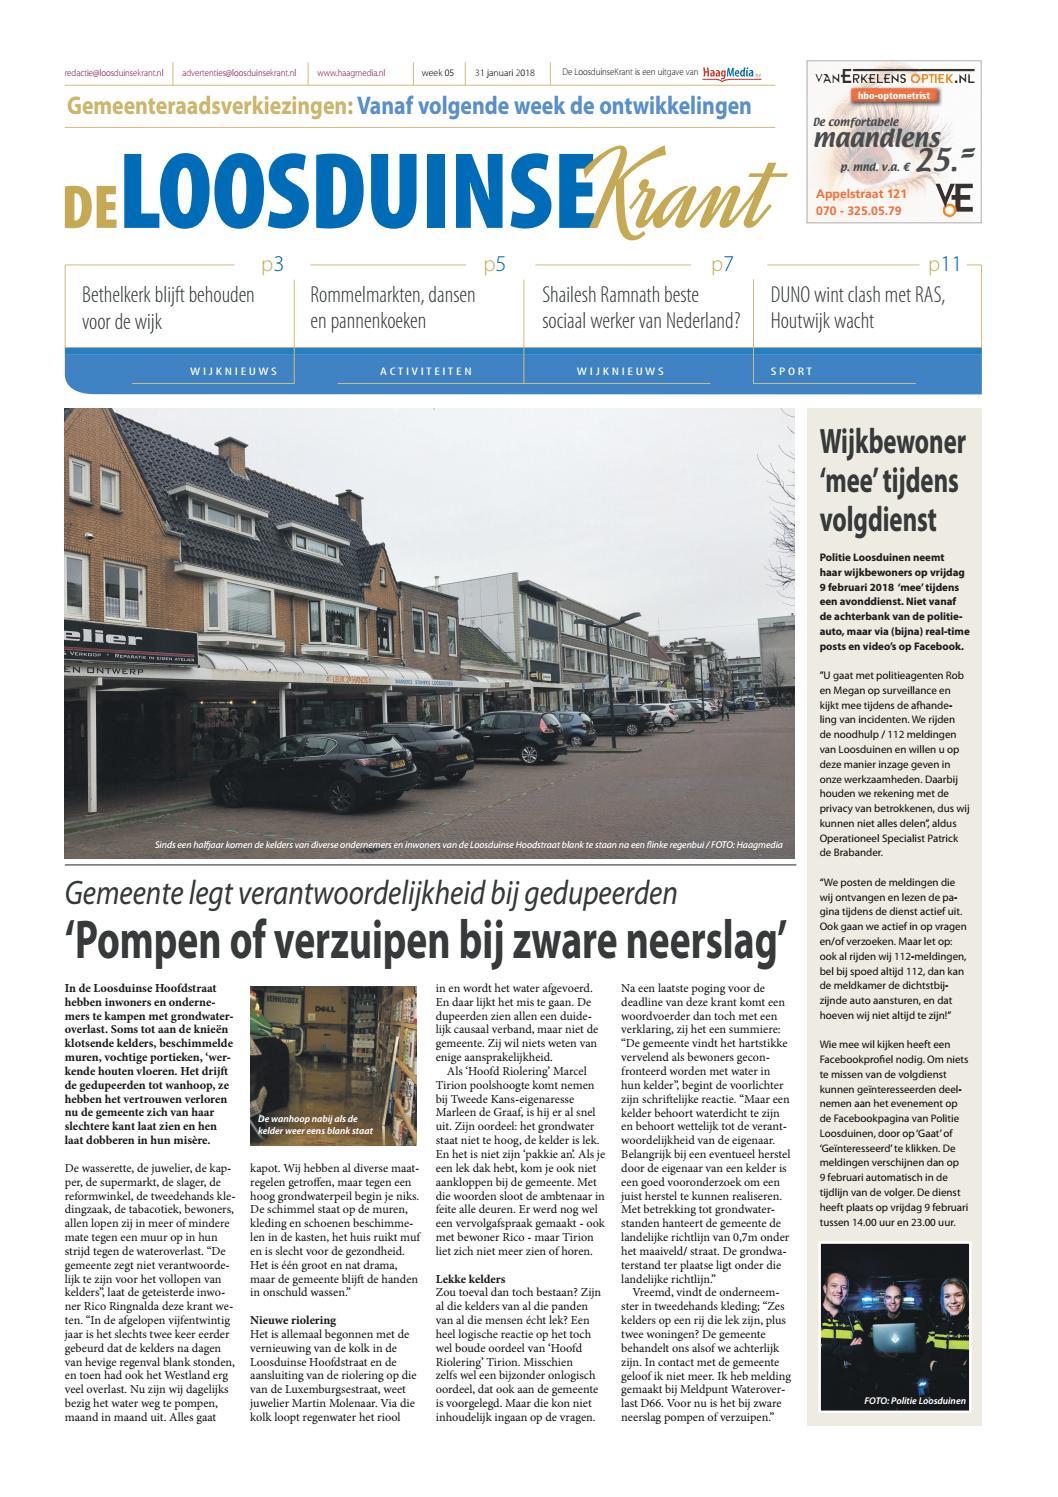 De LoosduinseKrant week 05 - 2018 by HaagMedia - issuu